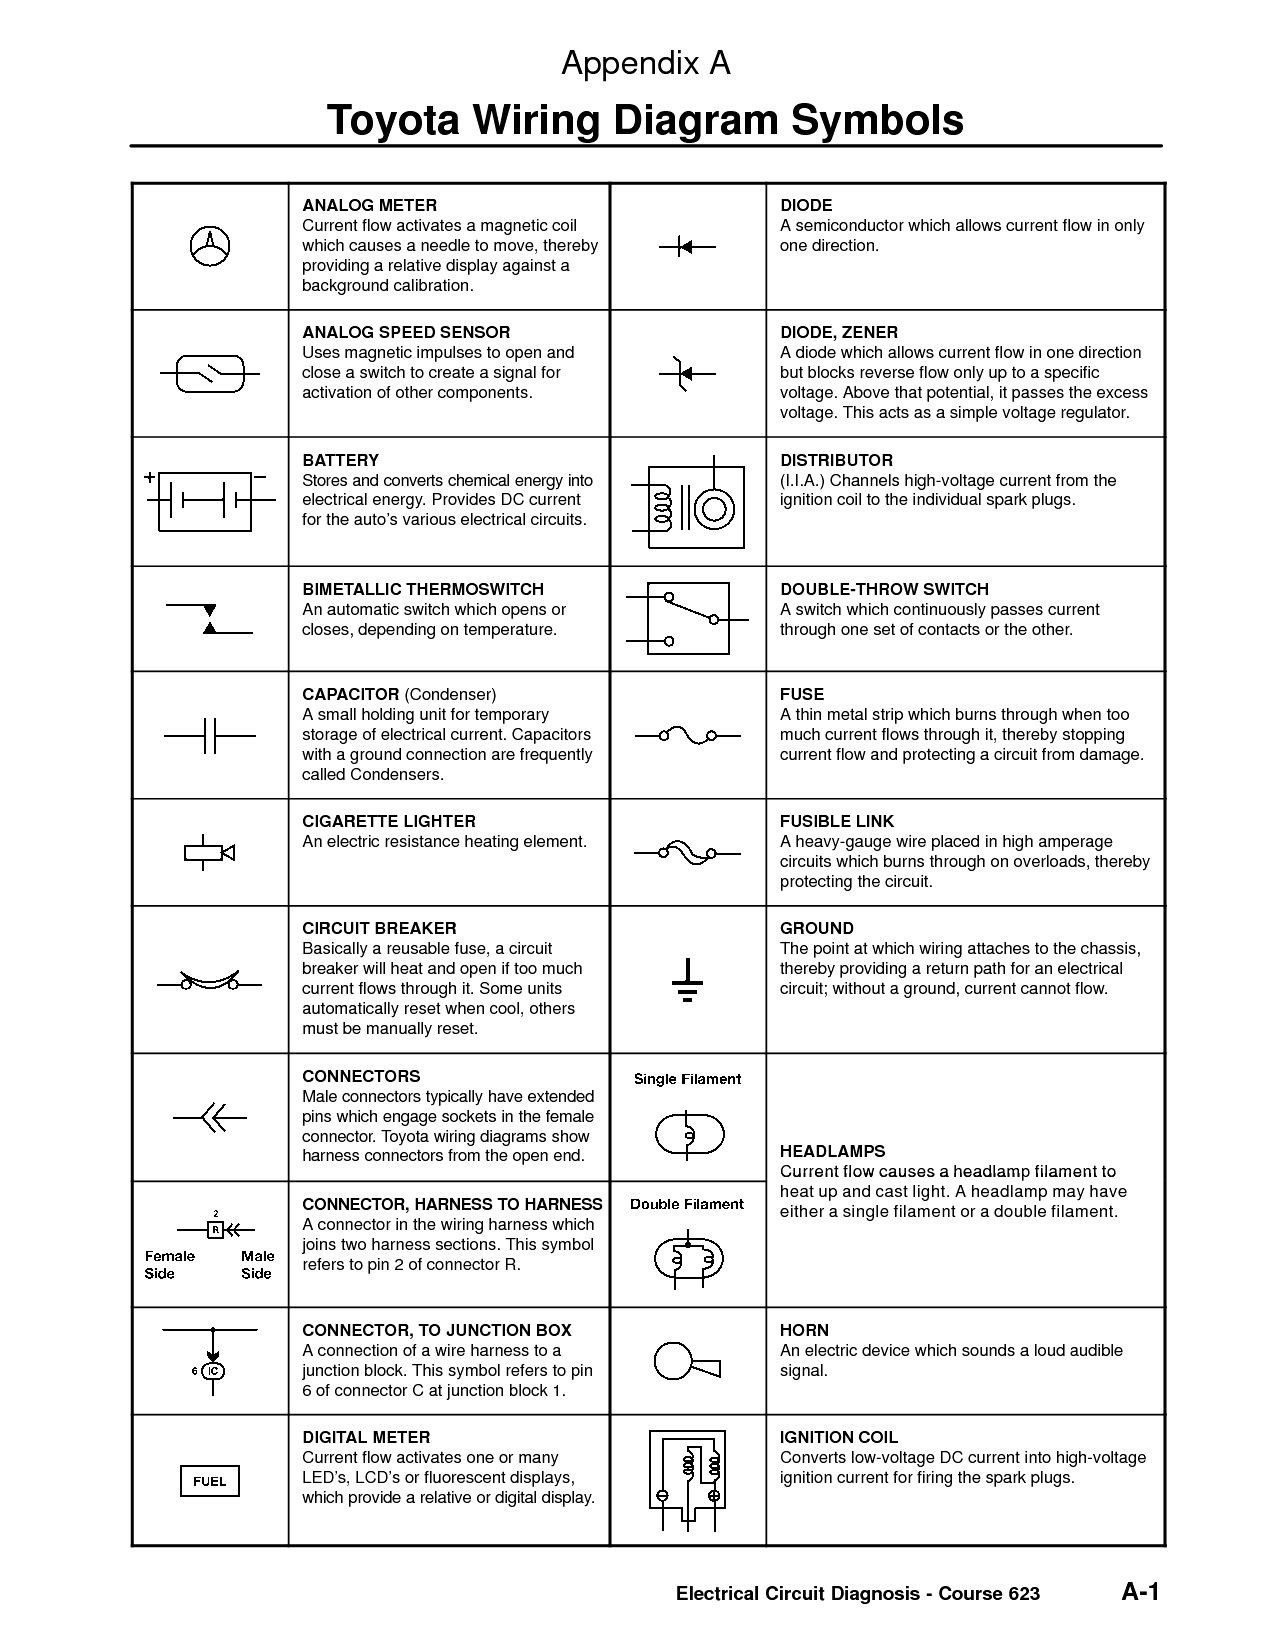 [NRIO_4796]   BD_9846] Electric Circuit Symbols All Schematic Symbols Chart Circuit  Symbols Wiring Diagram | Symbols Chart Electrical Wiring Diagrams Coil Core |  | Pala Pelap Inifo Hendil Mohammedshrine Librar Wiring 101